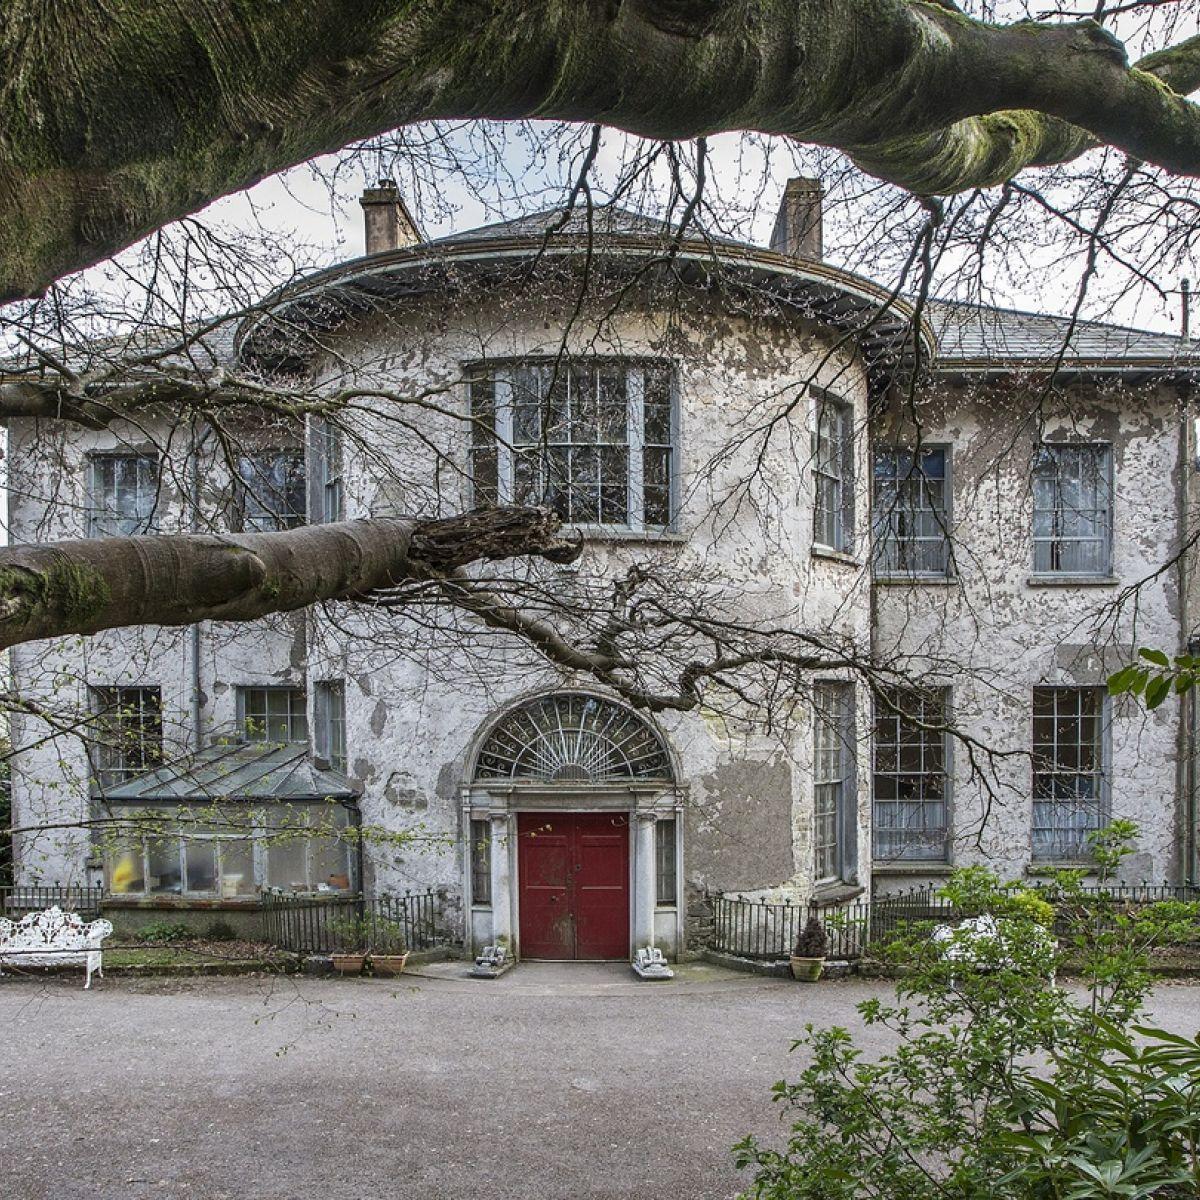 Vienna Woods Hotel | Luxury Hotel in Glanmire, County Cork